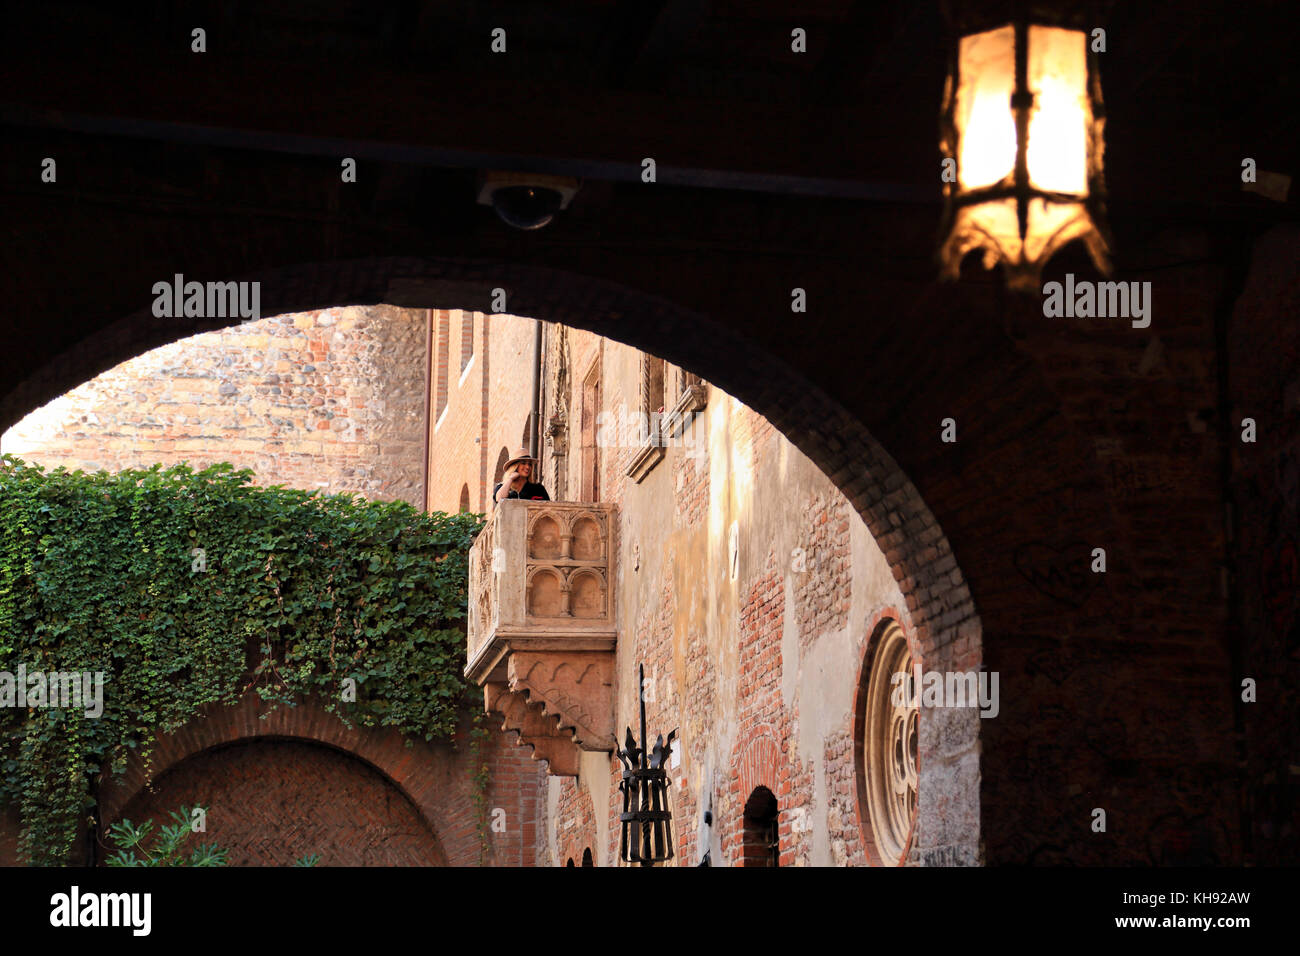 Julias Balkon. Haus von Romeo und Julia, Verona Stockbild